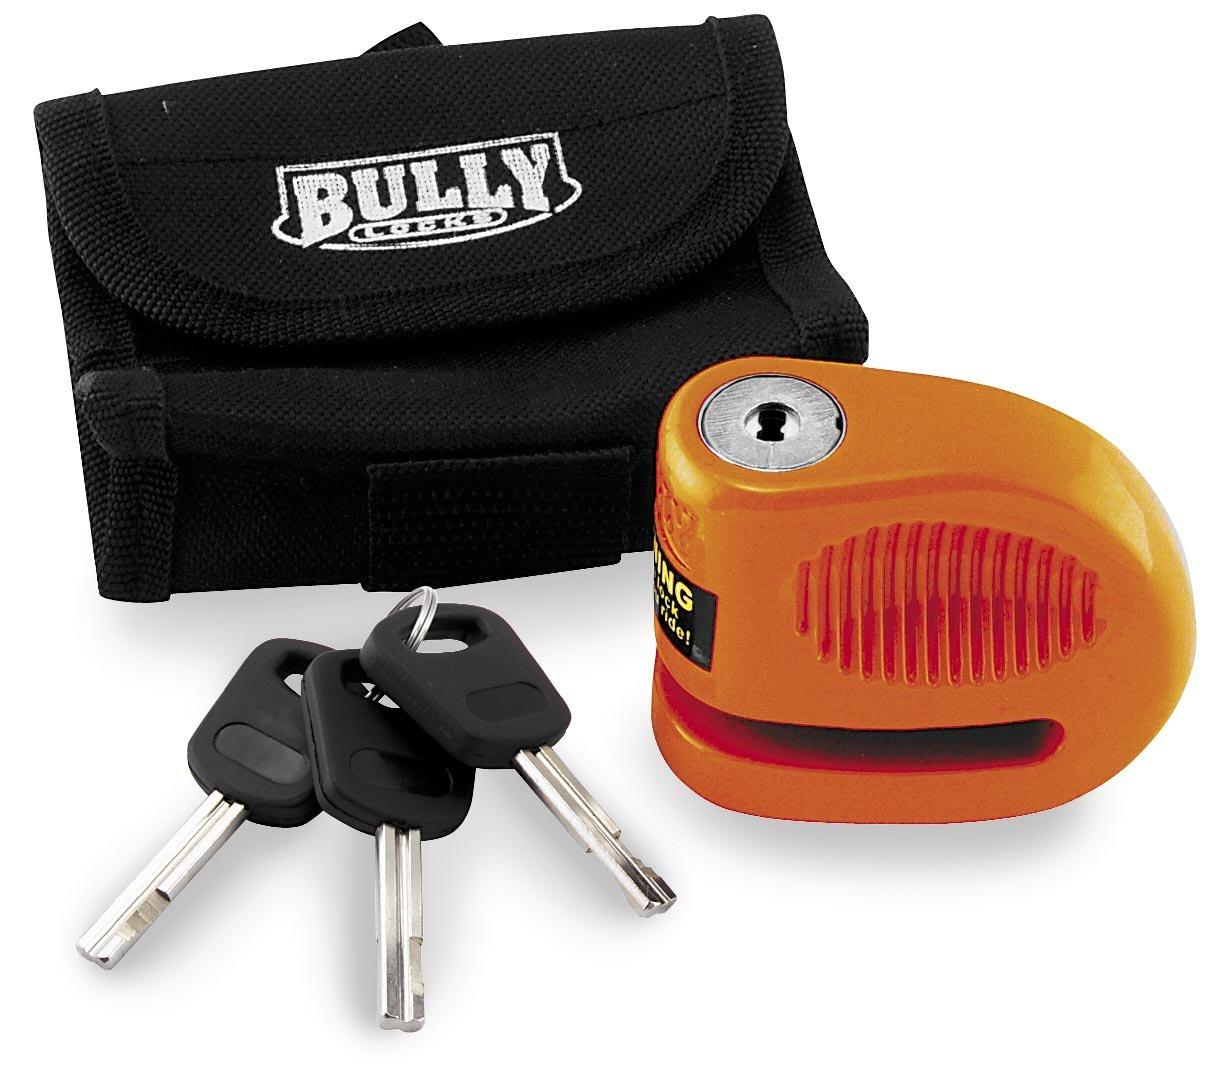 BULLY LOCKS 5.5MM LIL BULLY DISC LOCK STEEL ORANGE